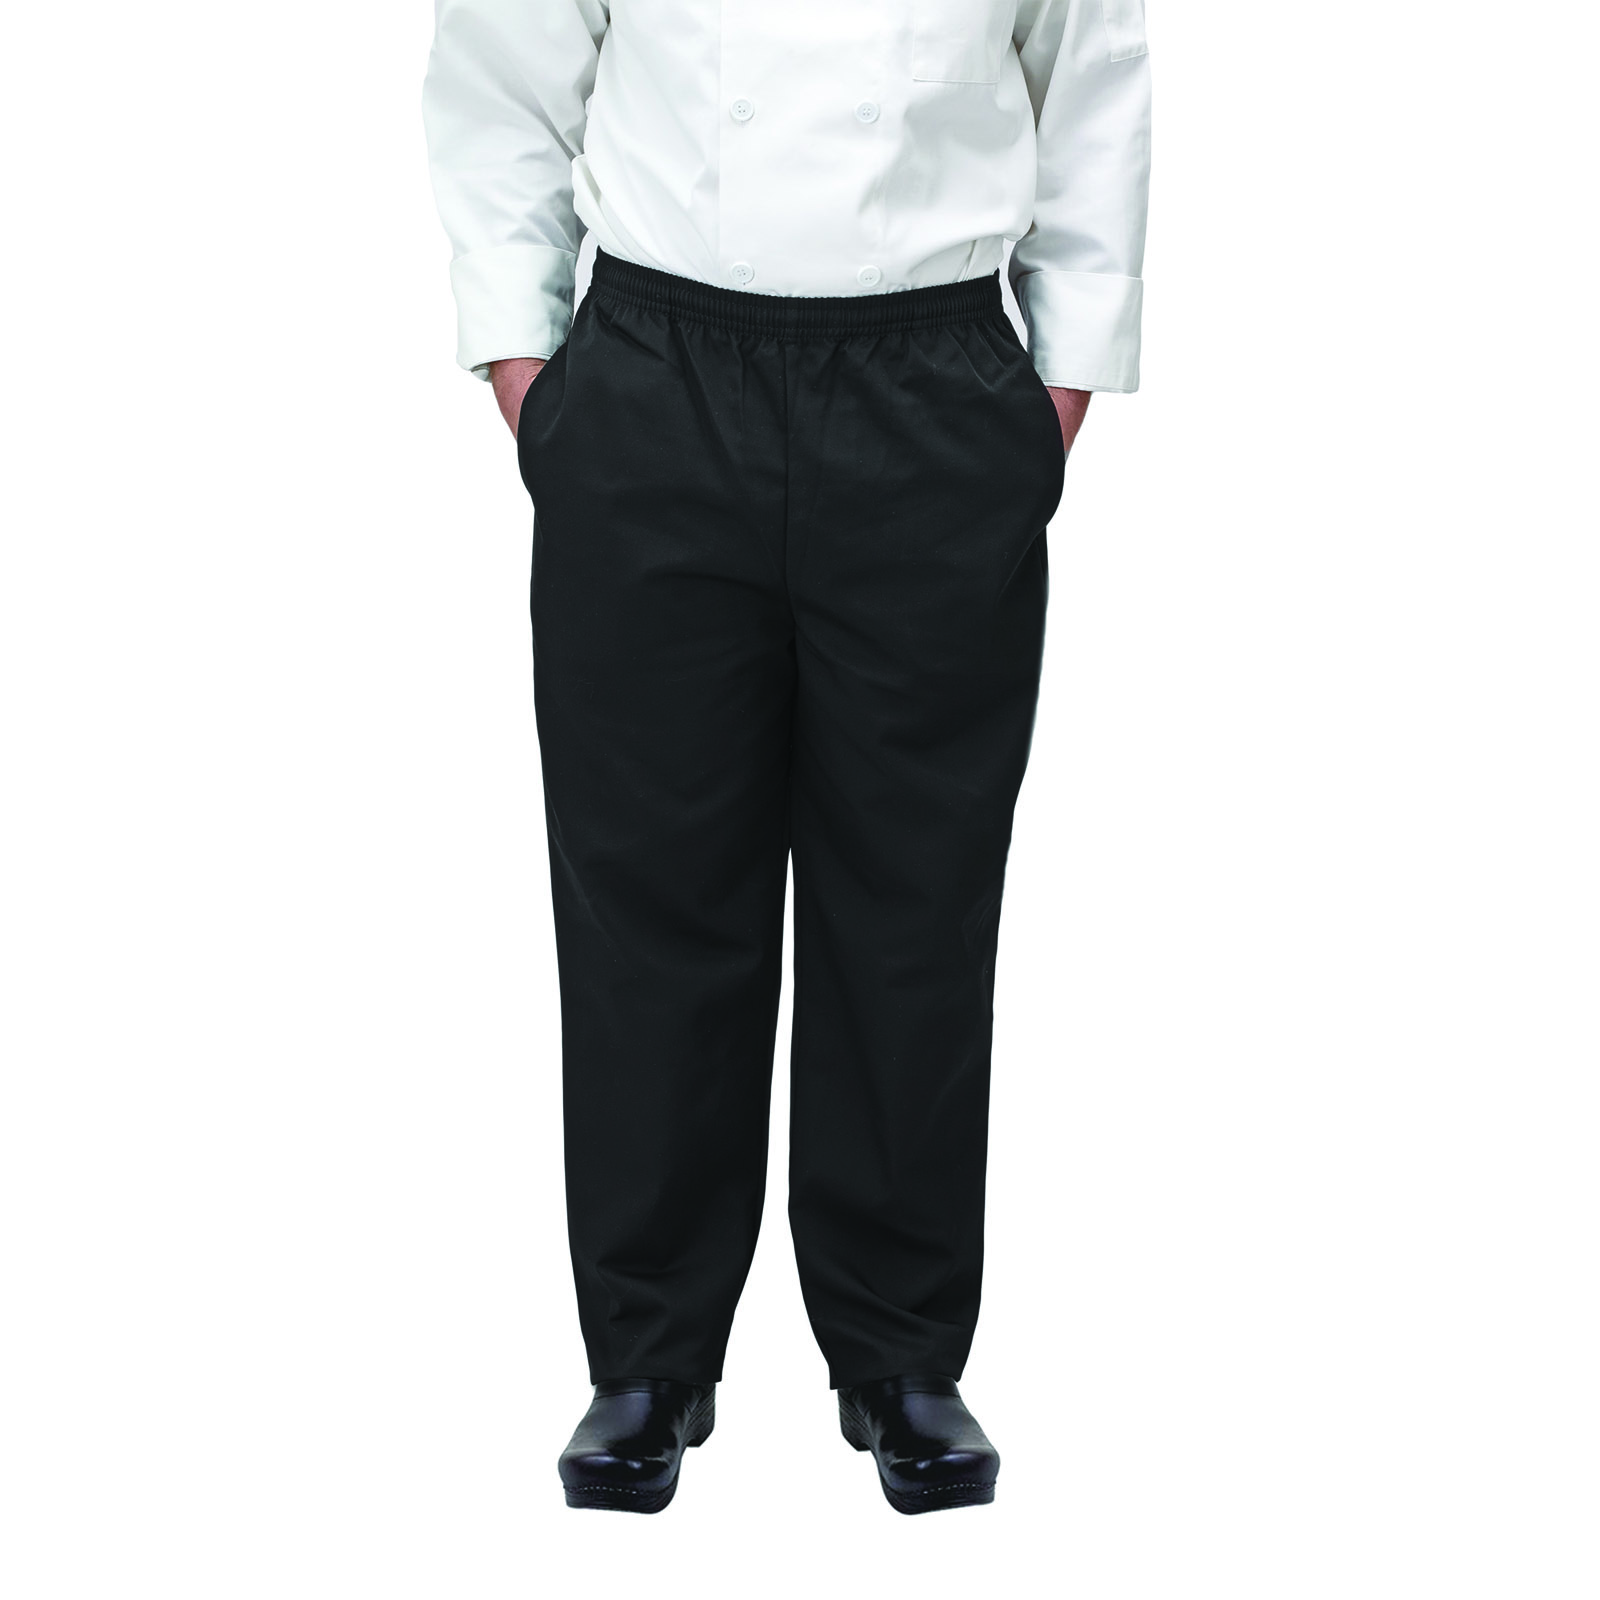 Winco UNF-2KXXL chef's pants